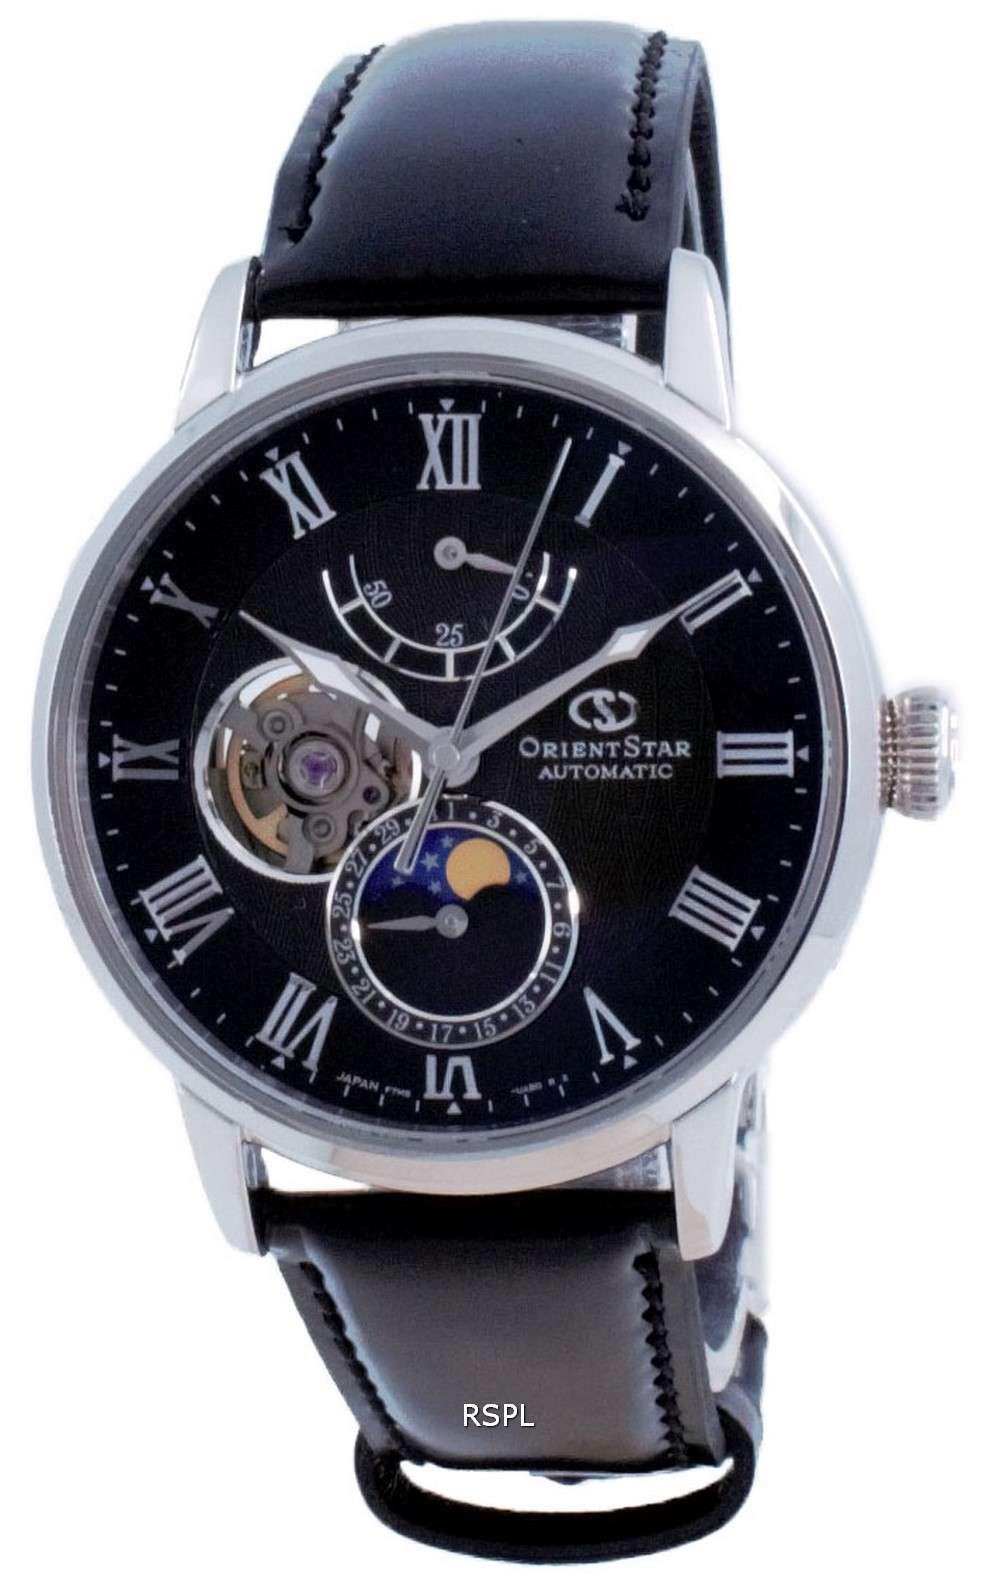 Reloj para hombre Orient Star Moon Phase Open Heart automático RE-AY0107N00B